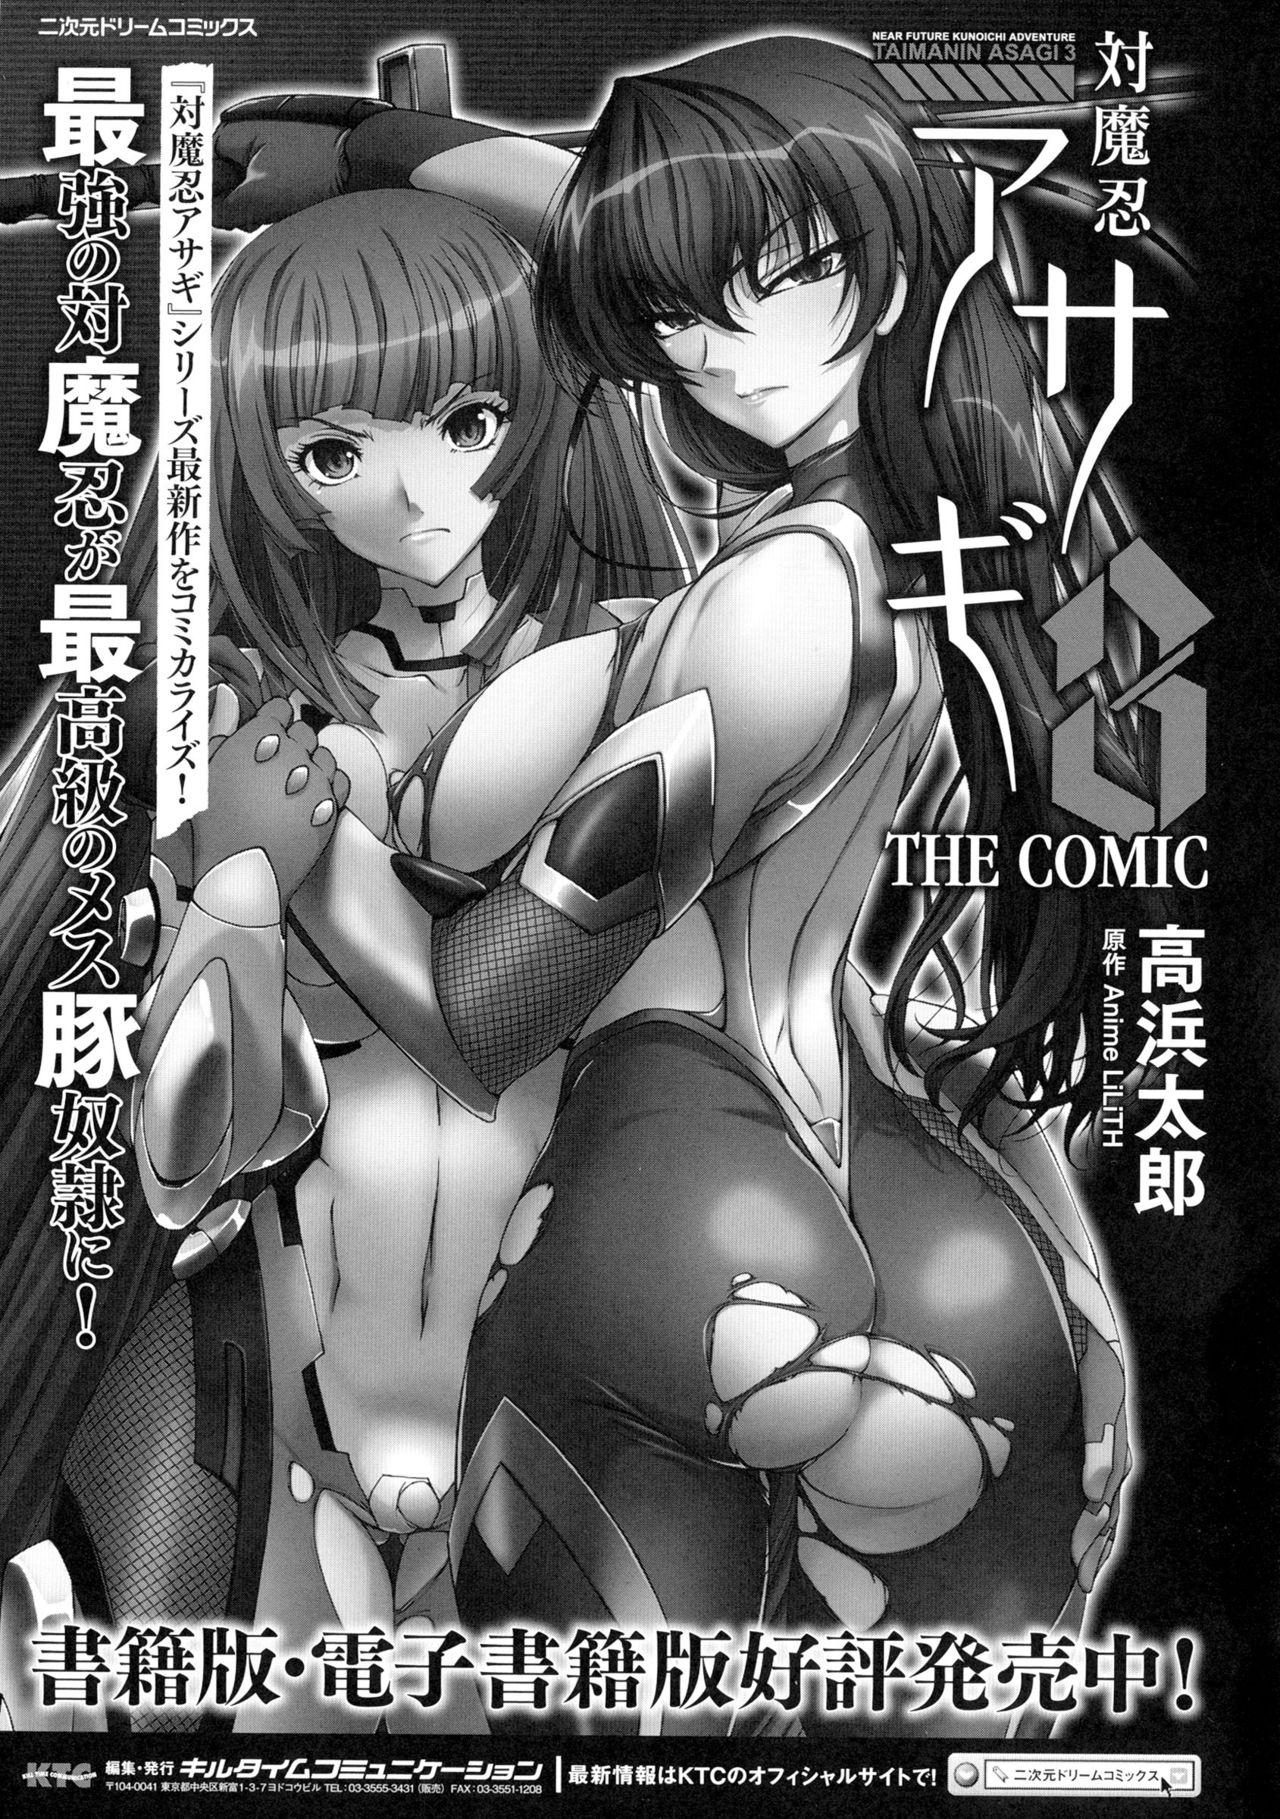 Seigi no Heroine Kangoku File DX Vol. 1 69